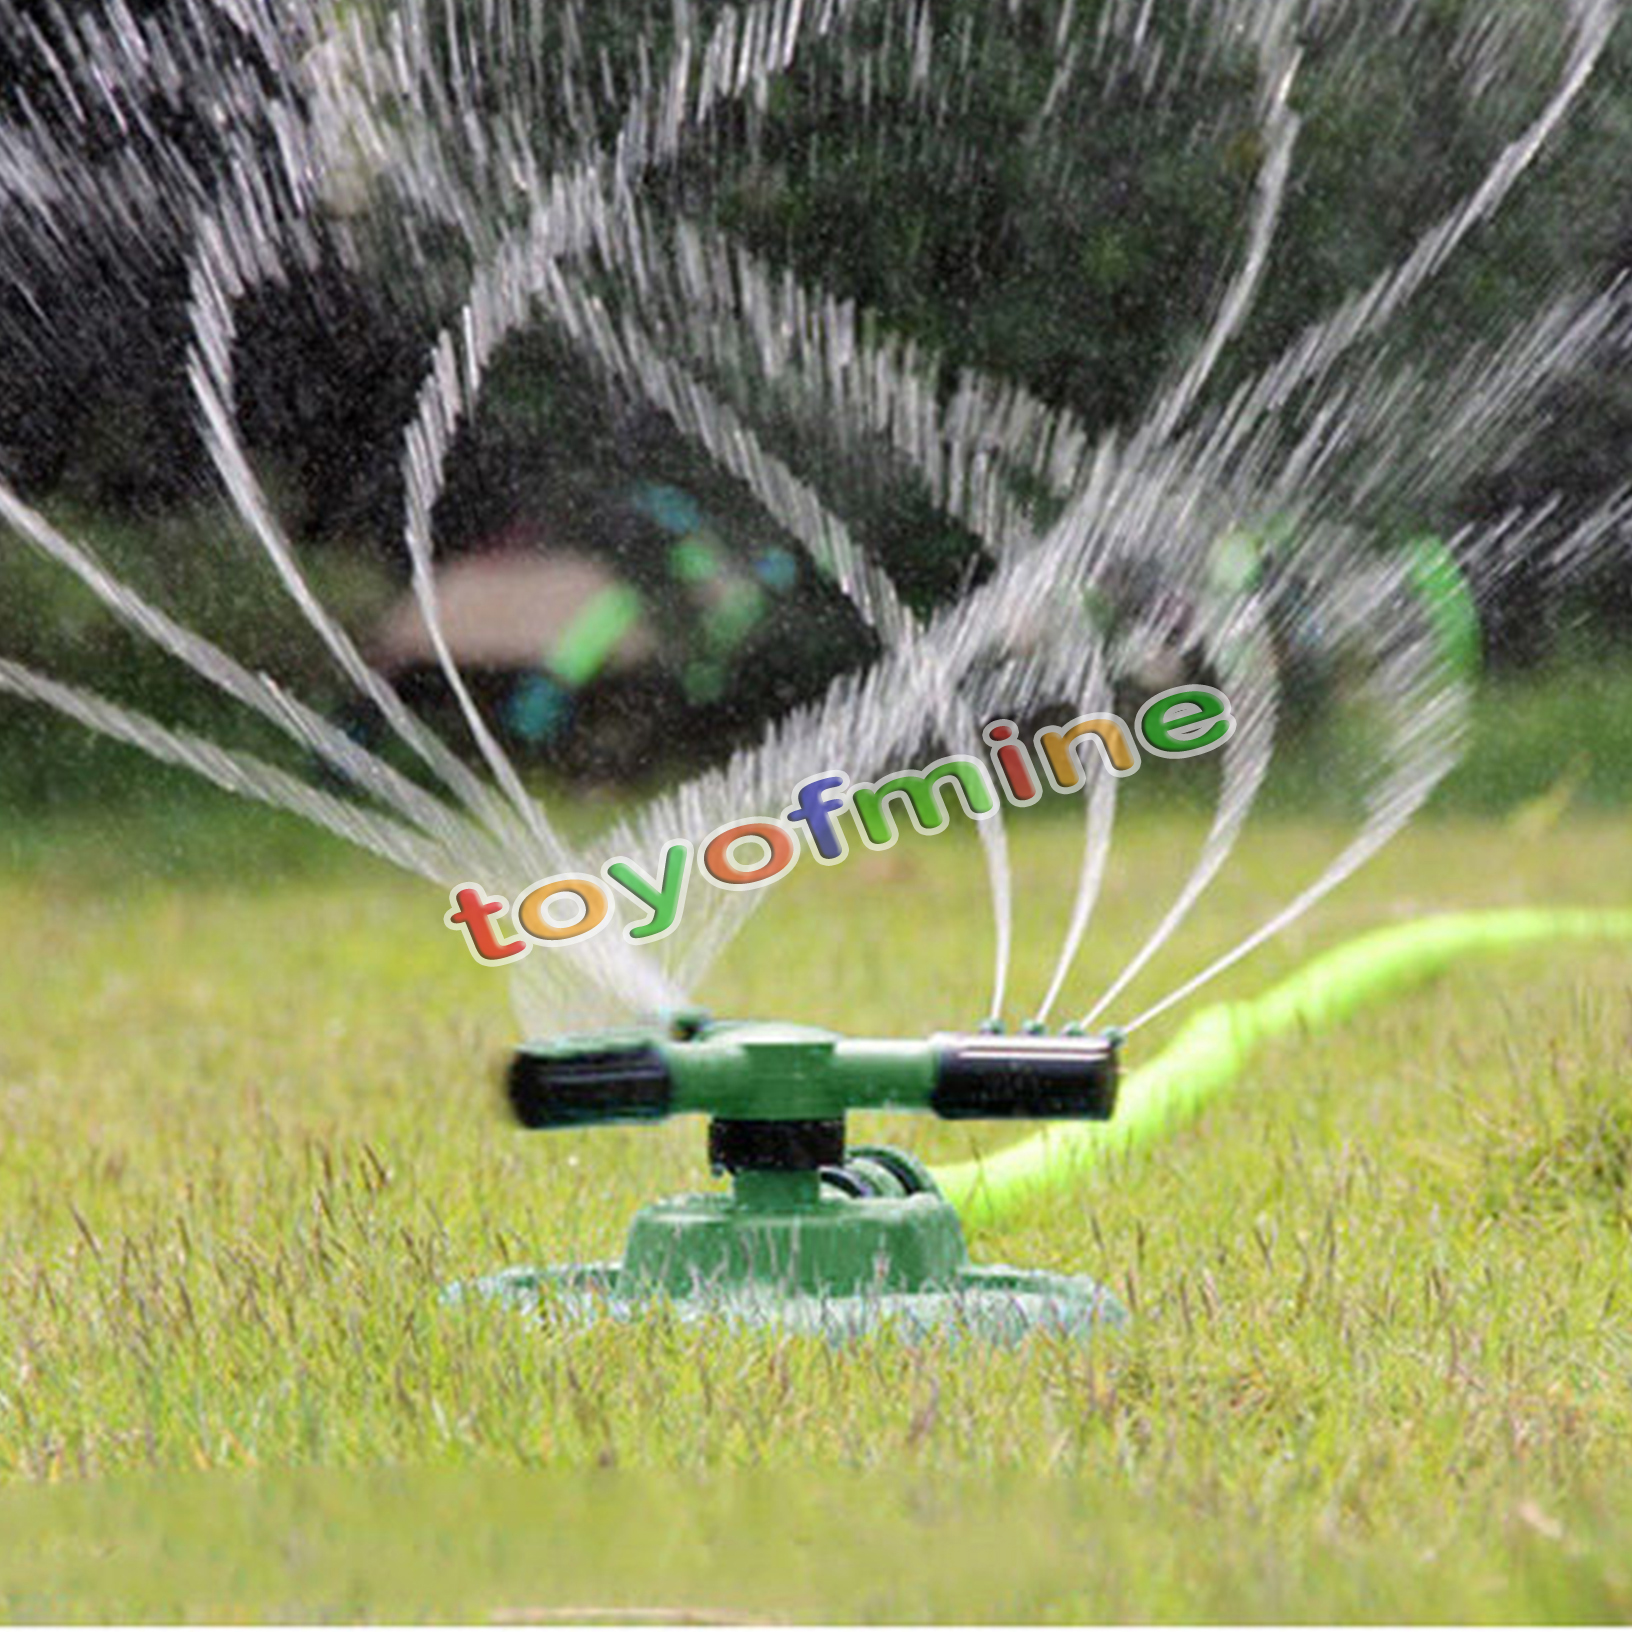 360 Lawn Circle Rotating Water Sprinkler 3 Nozzle Garden Pipe Hose Irrigation Ebay